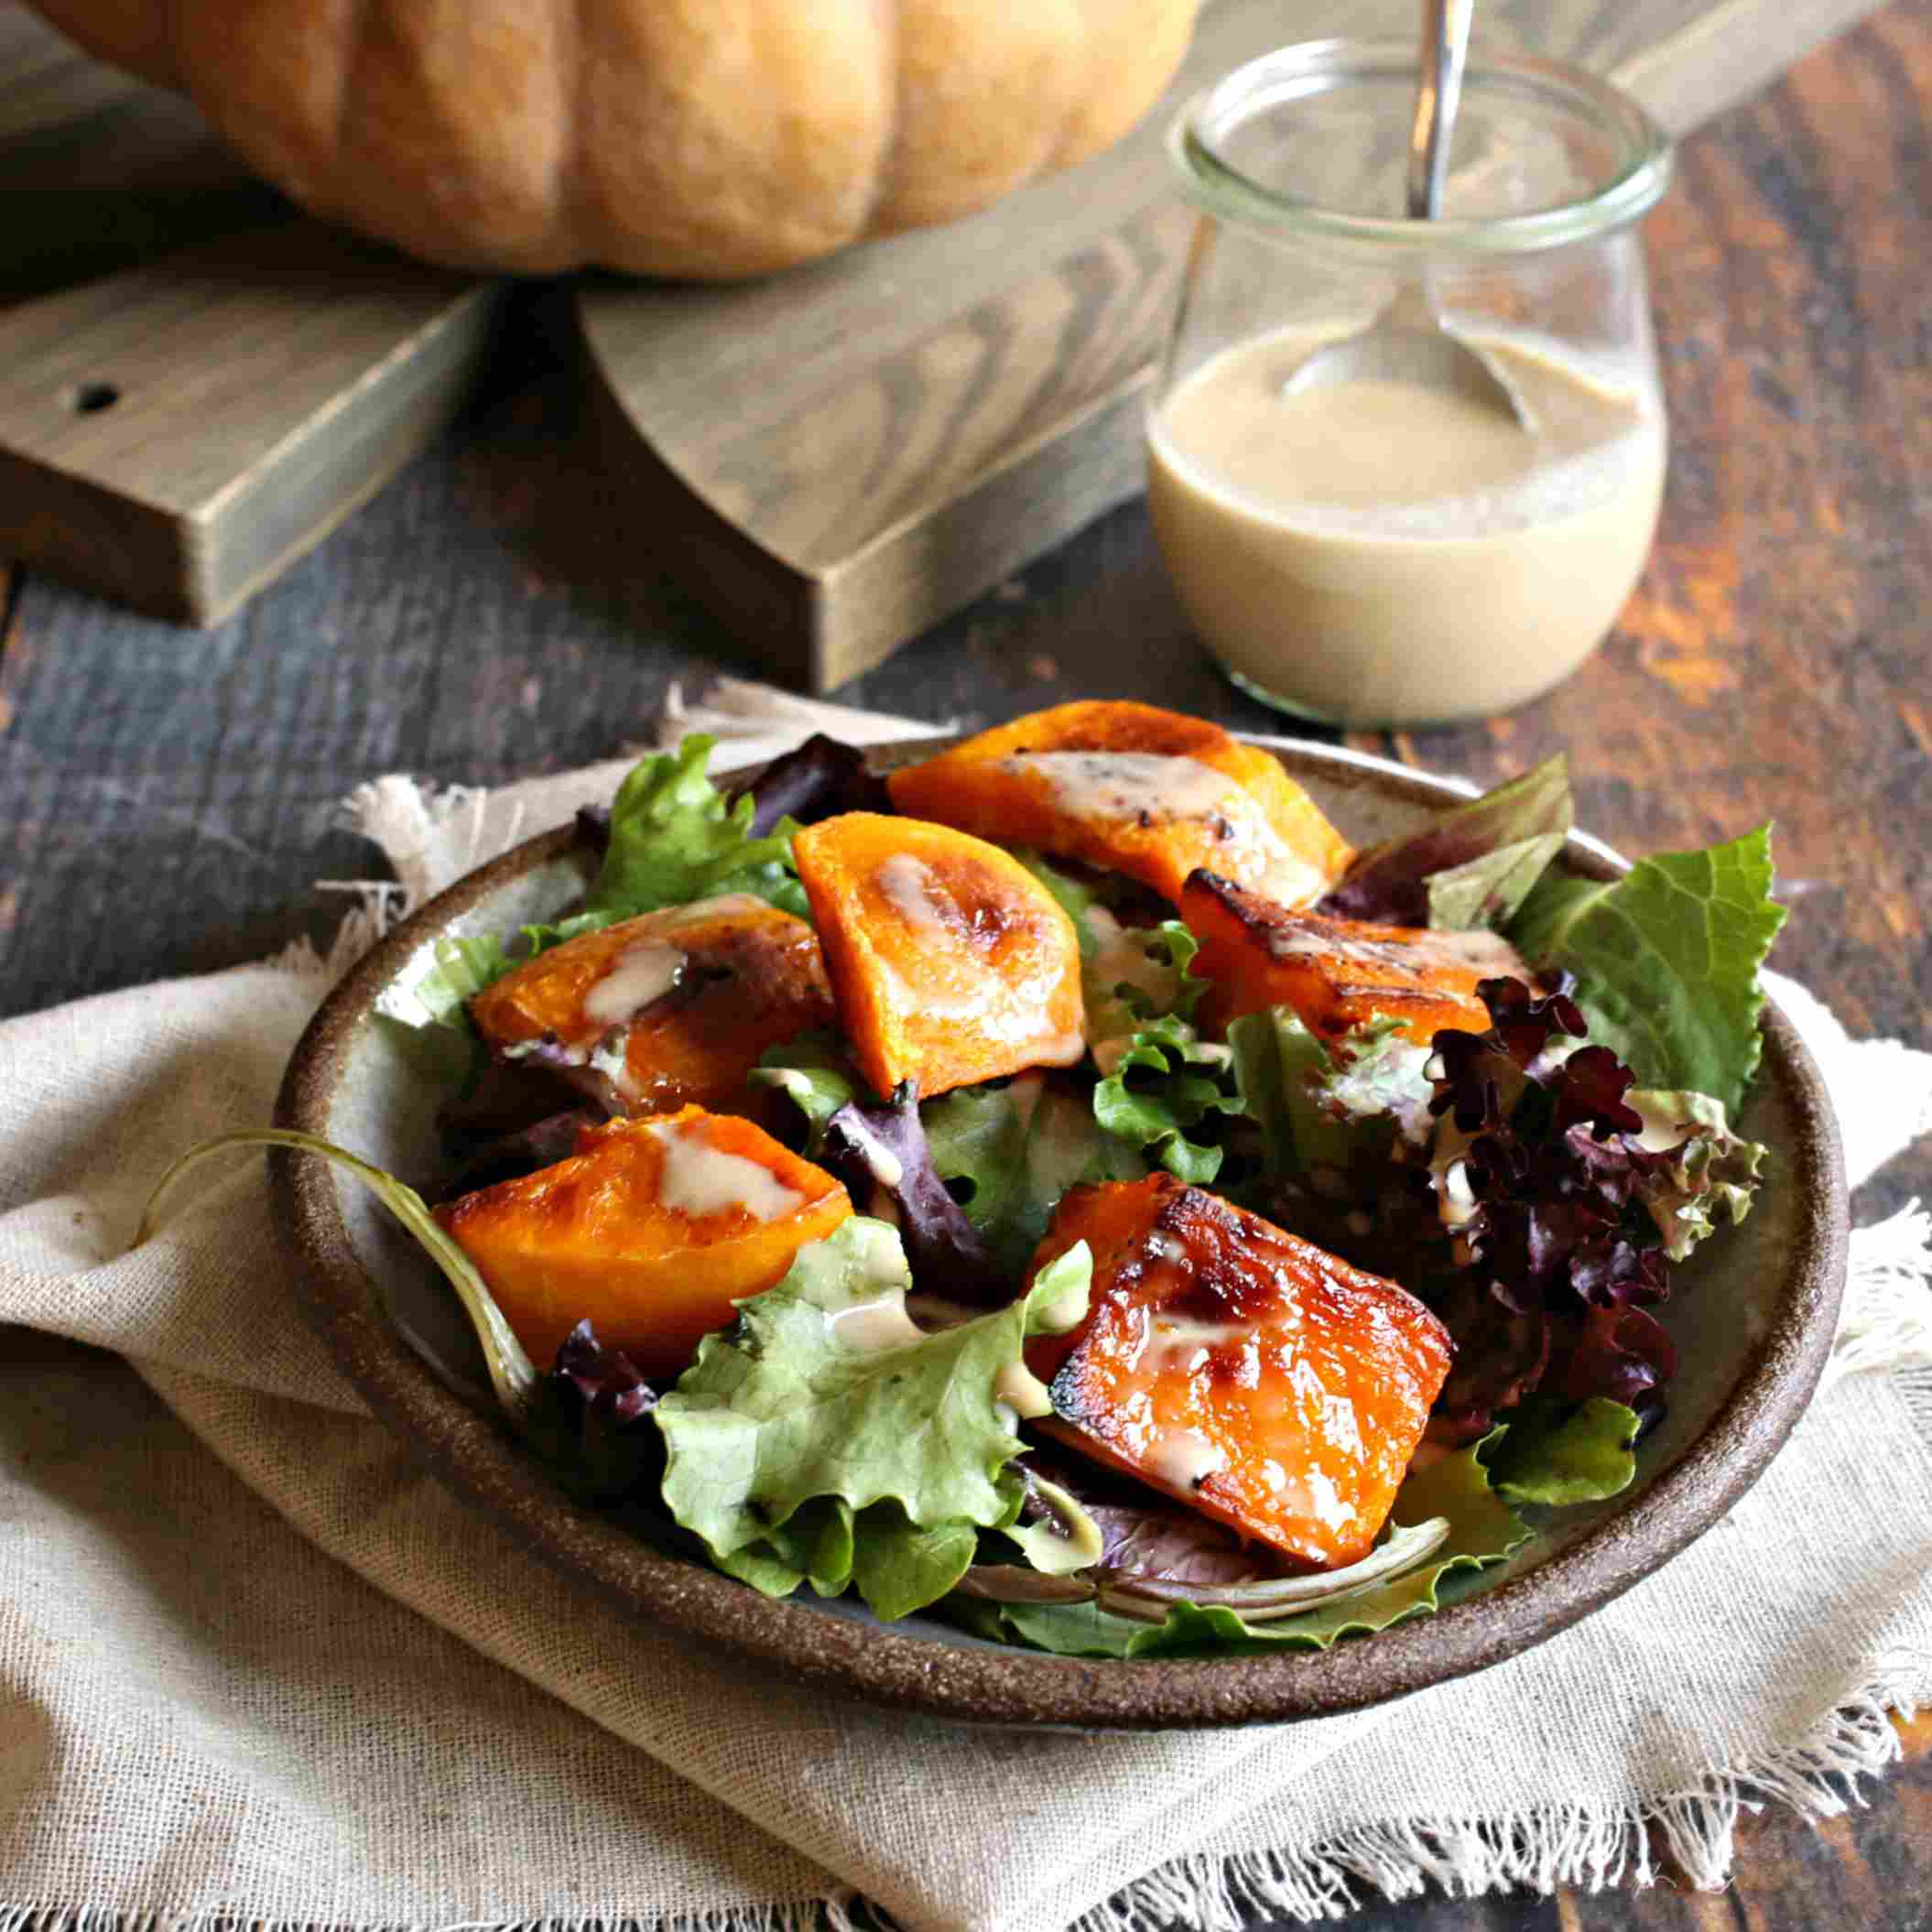 Warm Roasted Pumpkin Salad with Maple Tahini Dressing